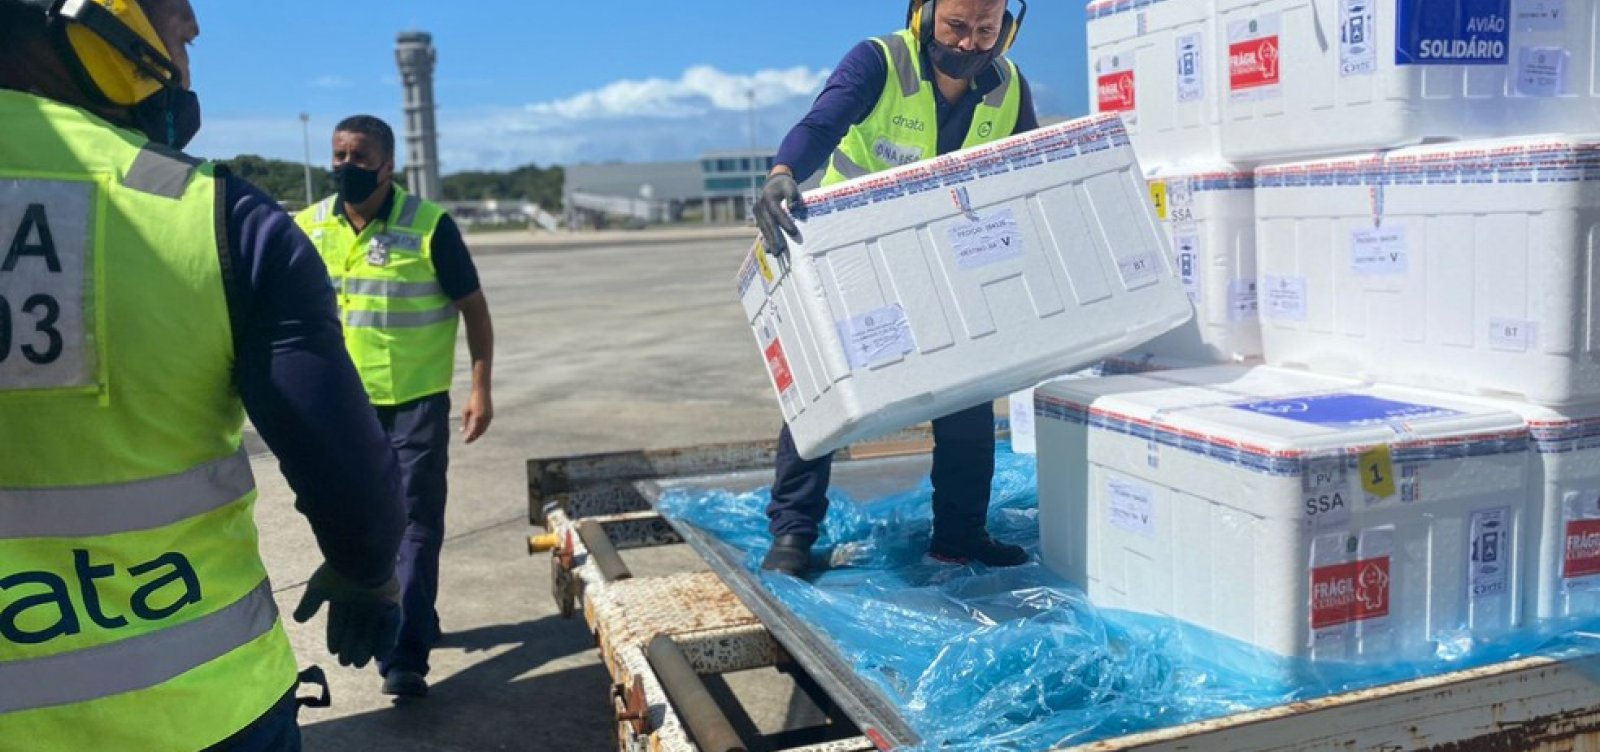 Bahia recebe mais de 340 mil doses de vacinas contra a Covid-19